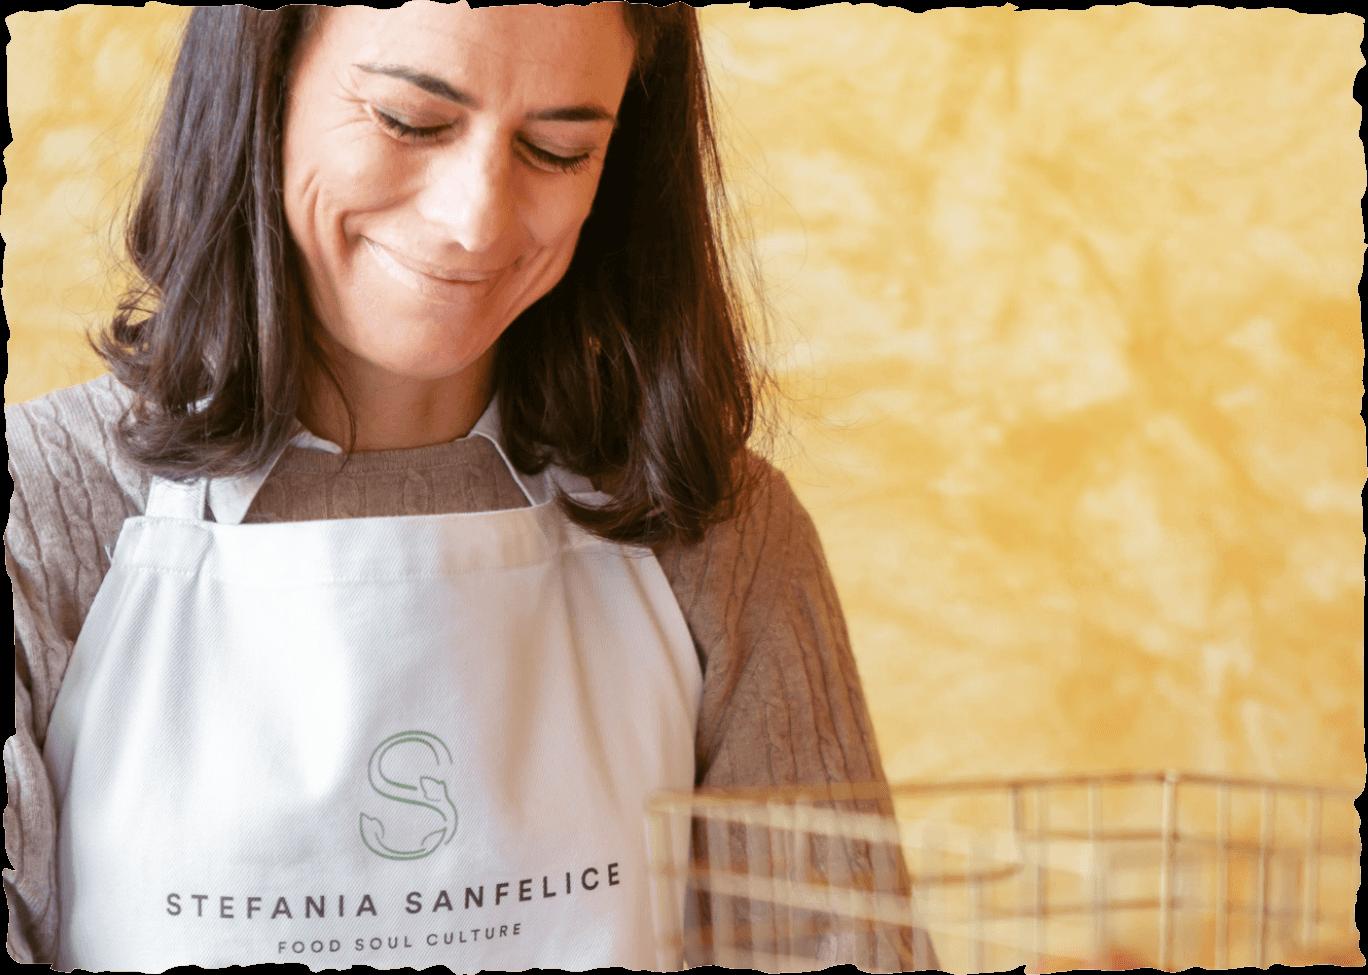 Home - Stefania Sanfelice